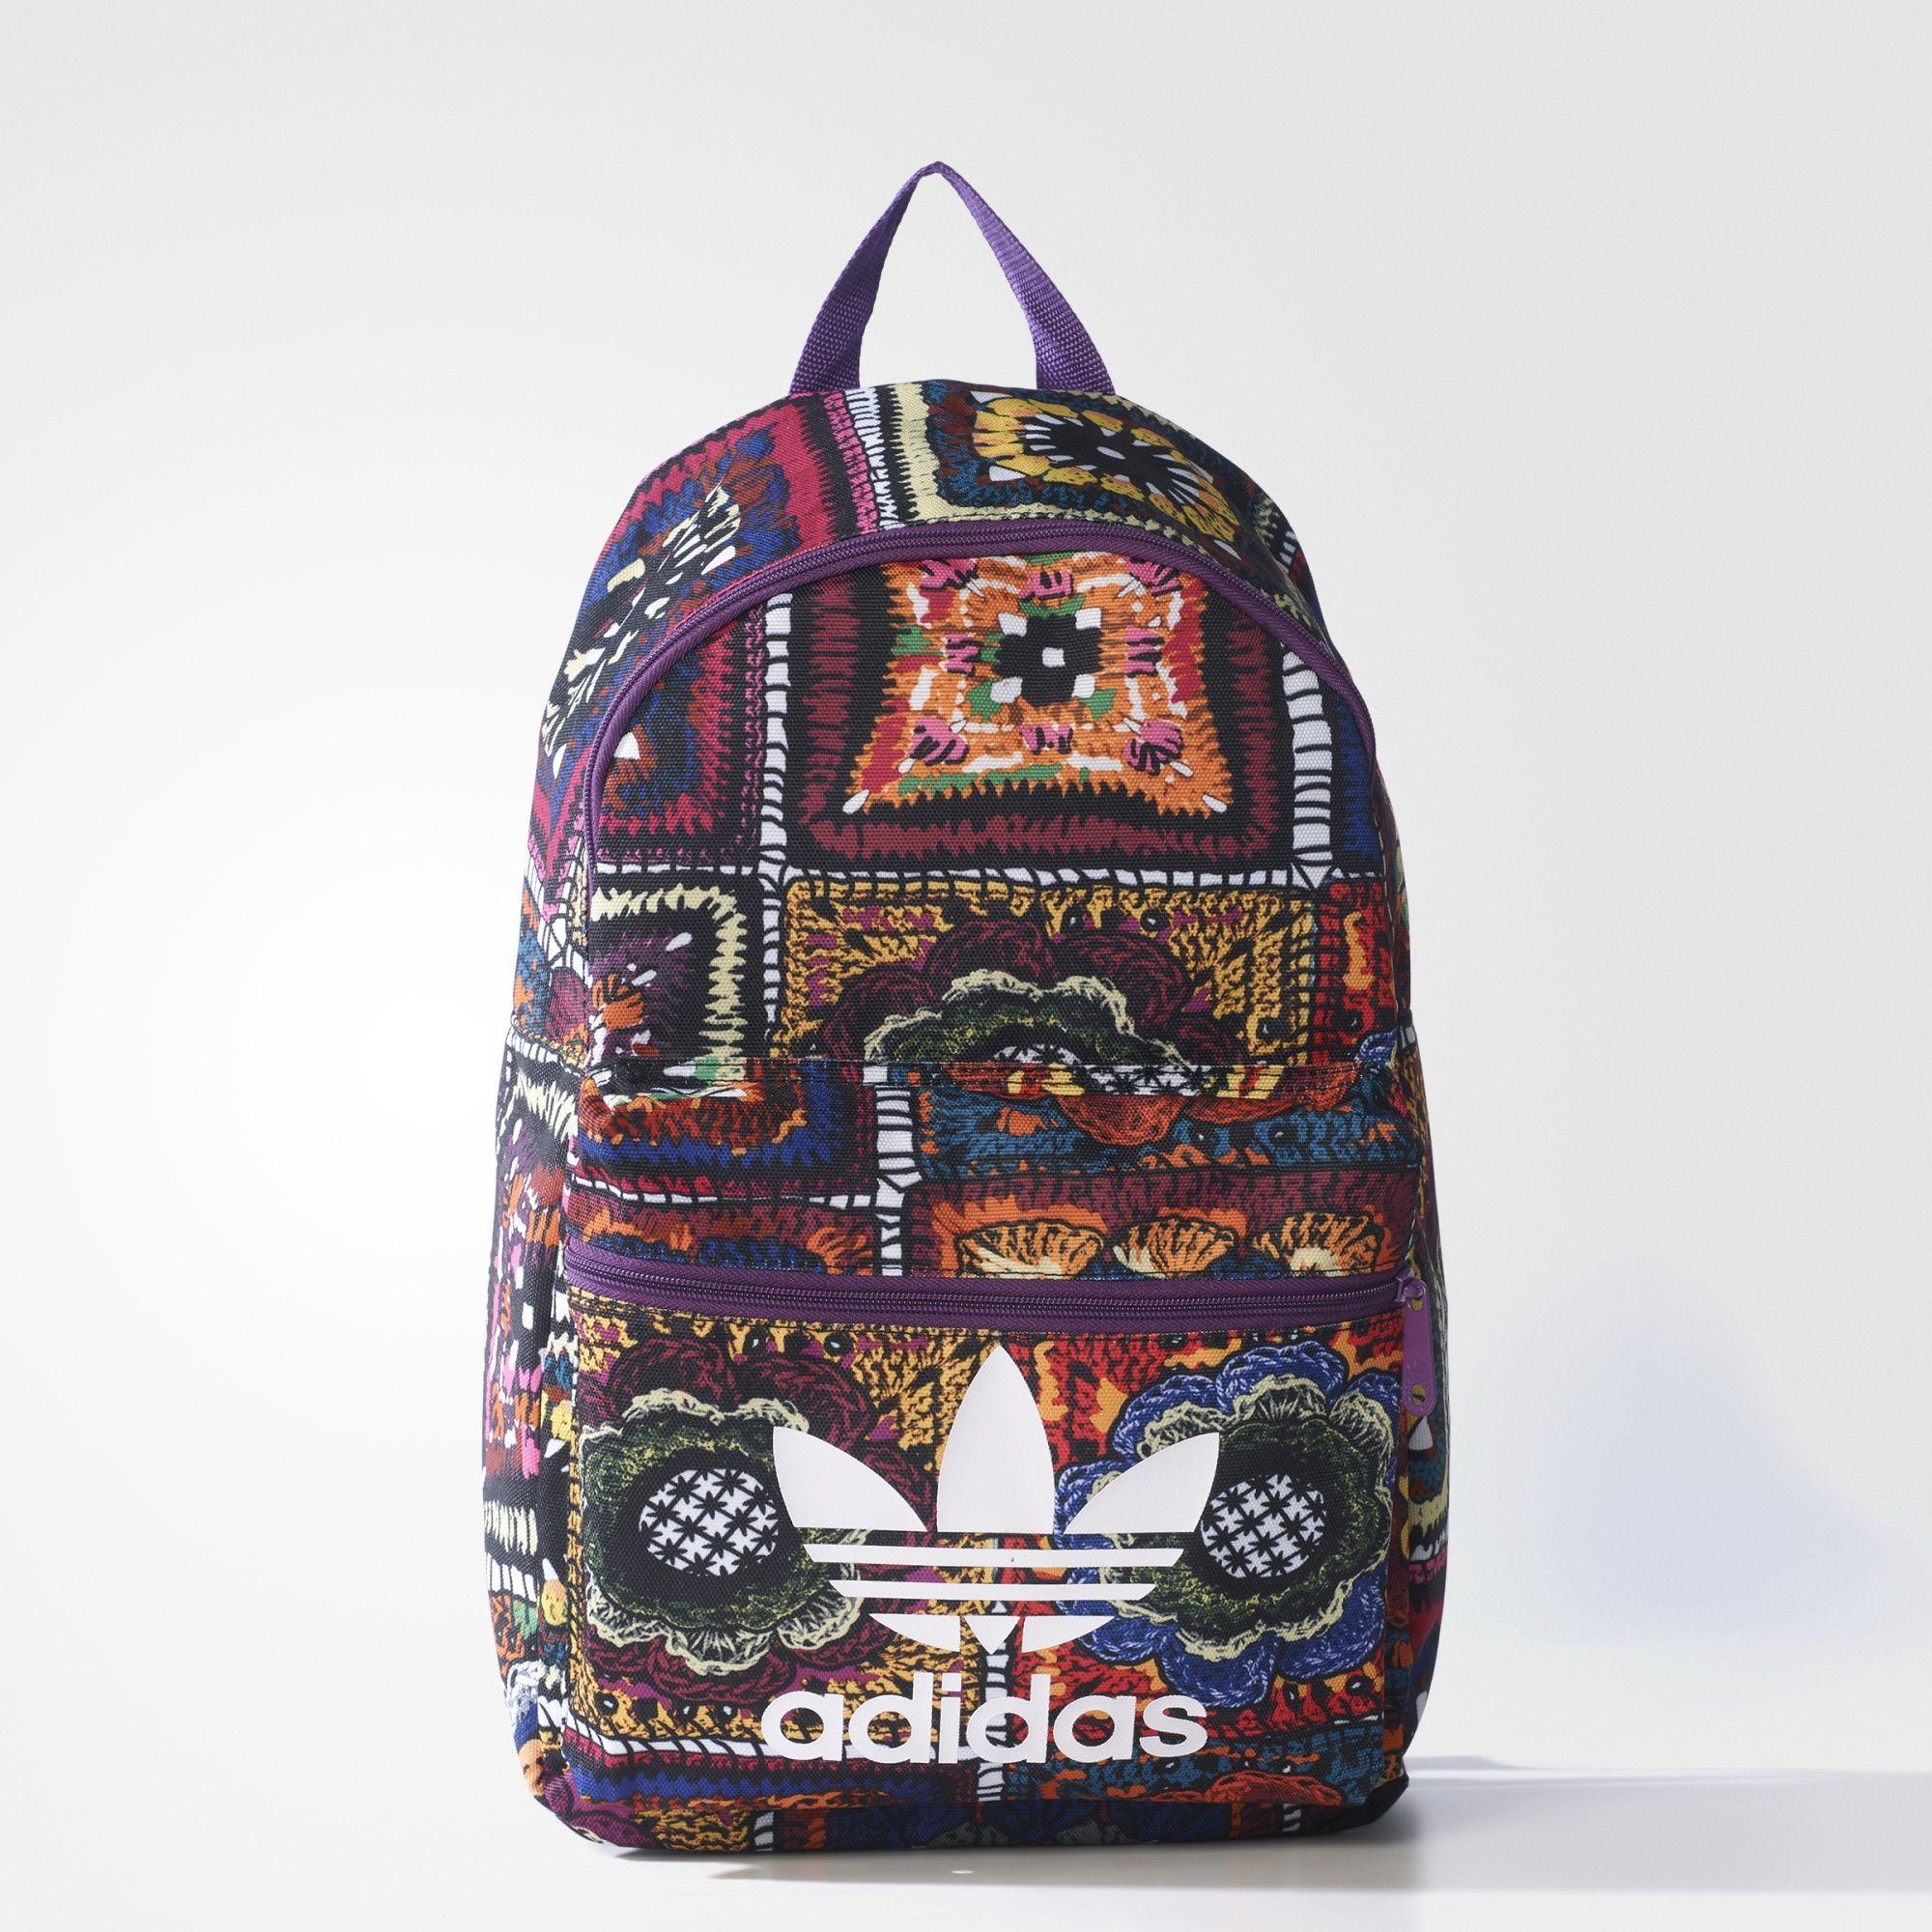 c53f418f8 adidas - CROCHITA CL BP Morrales Deportivos, Bolsas Lindas, Mochilas  Lindas, Mochilas De